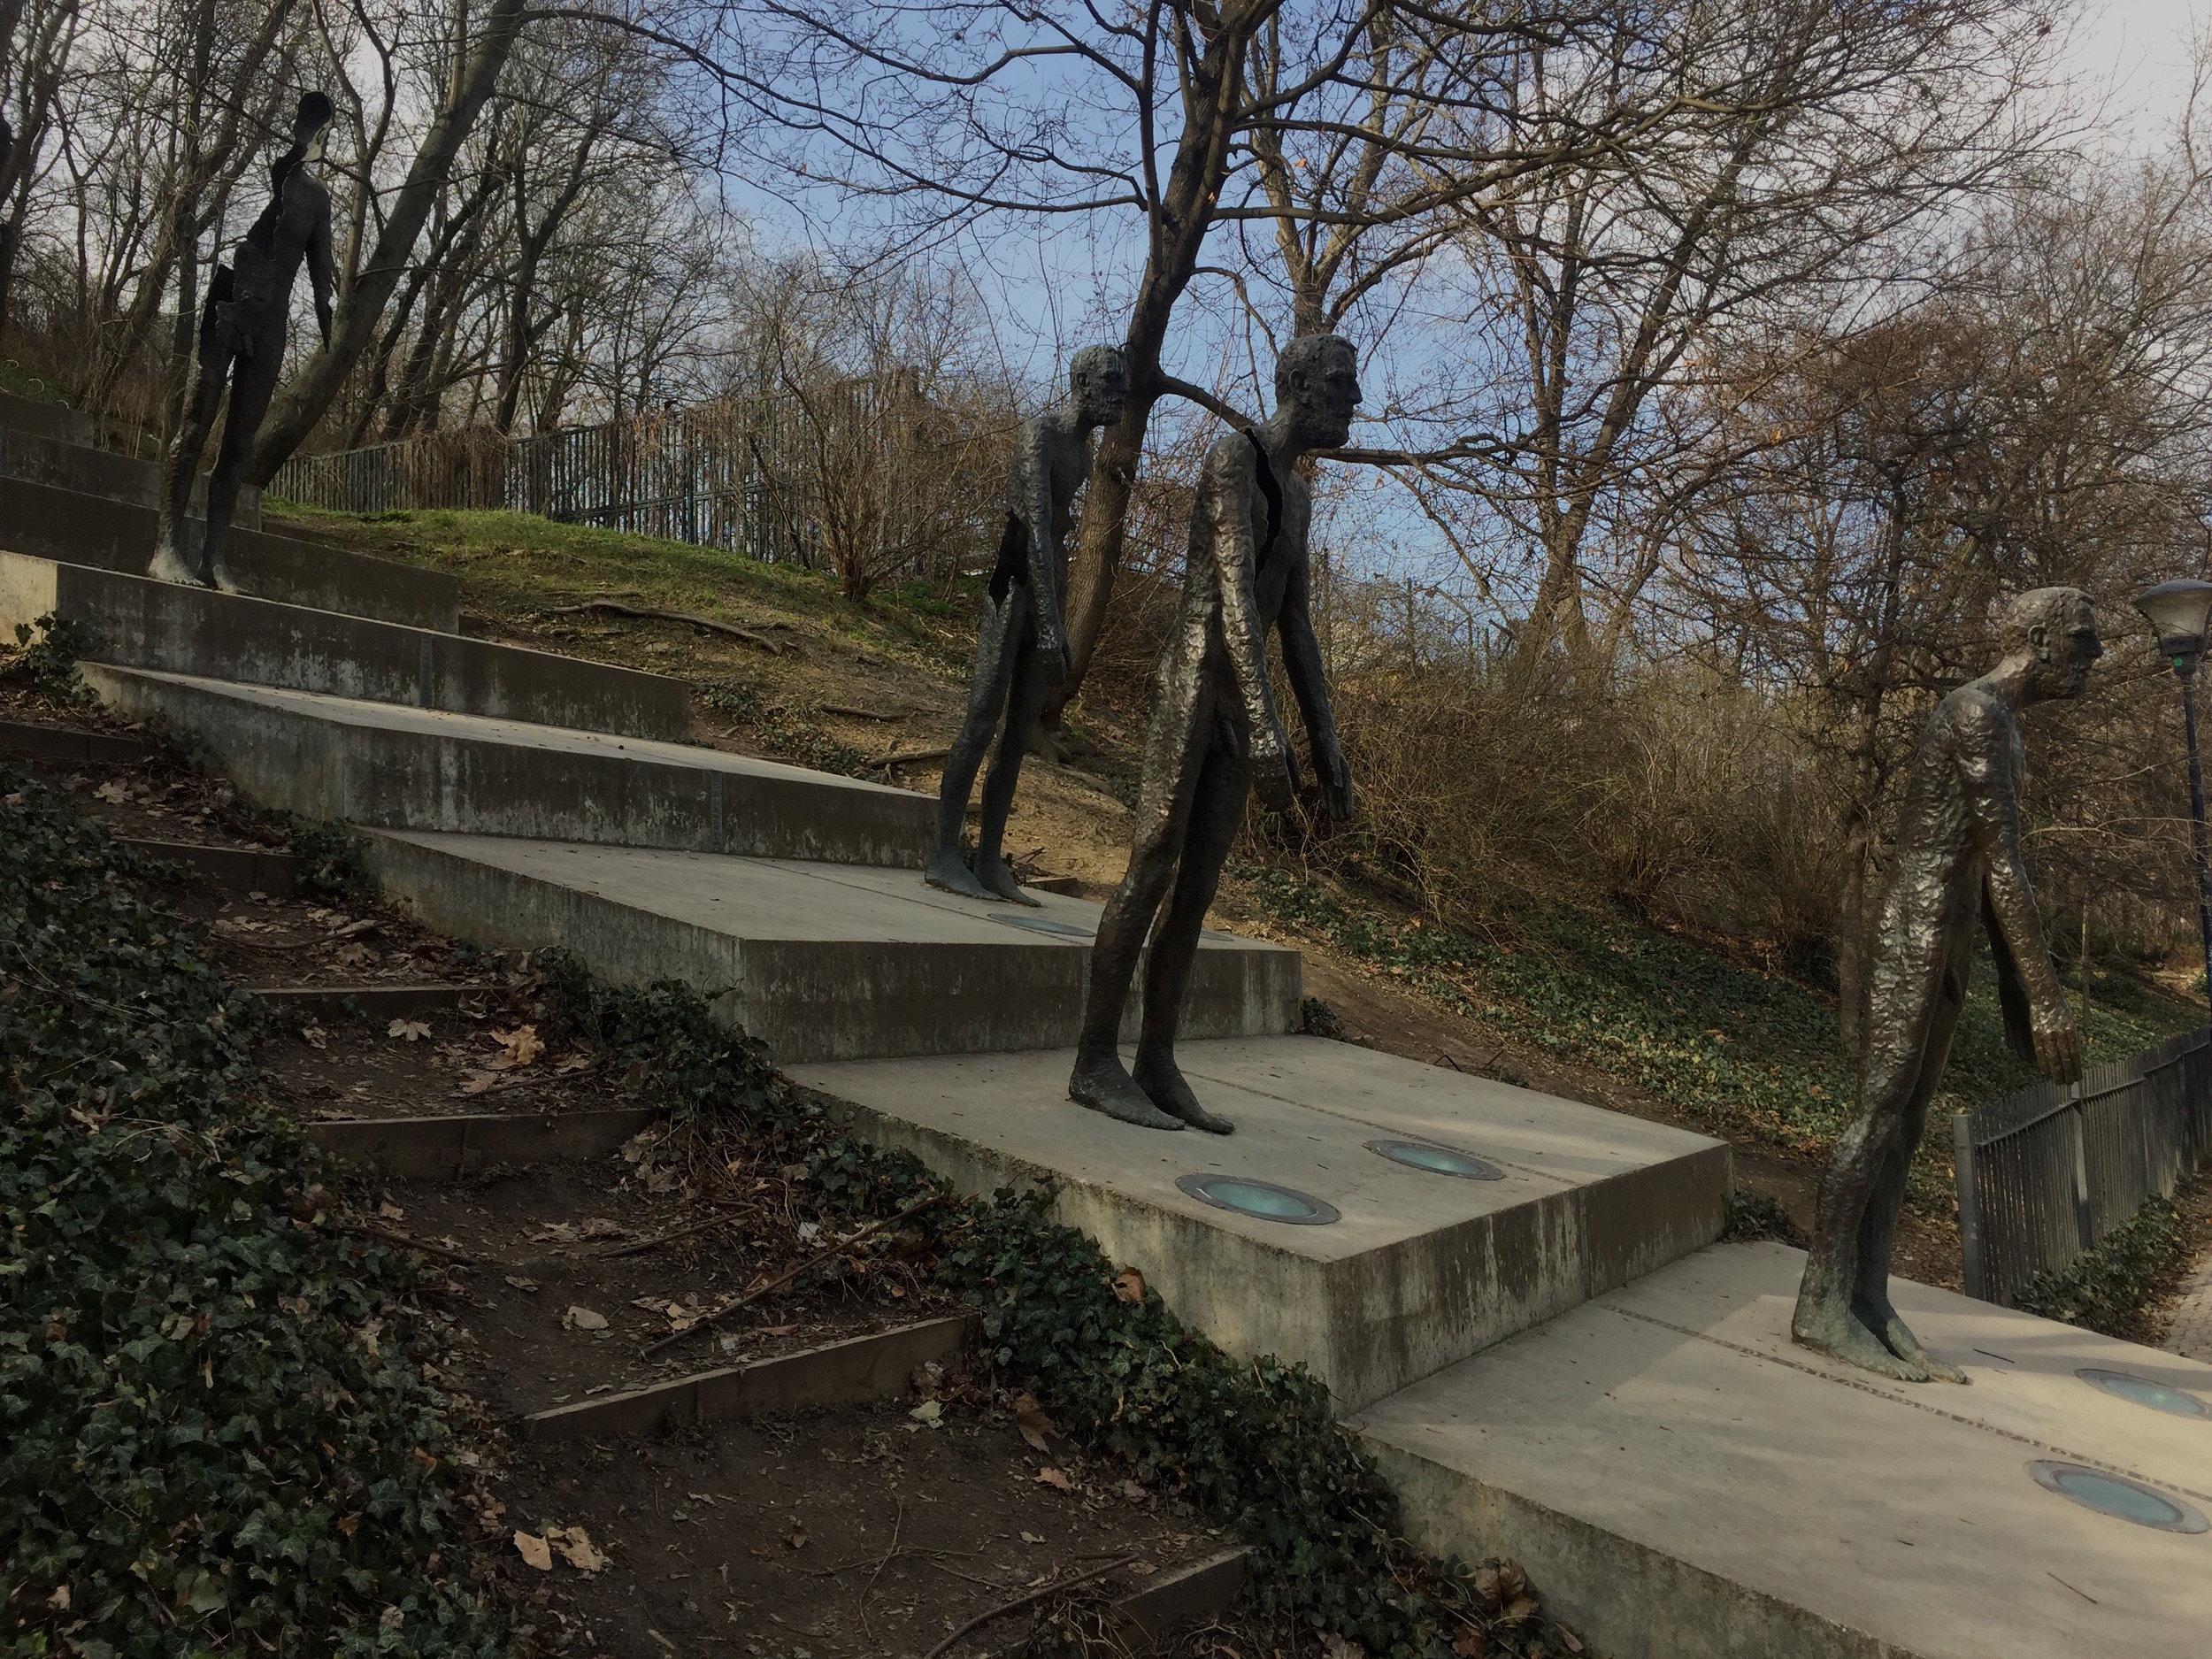 Sculptor:Olbram Zoubek, Architects:Jan Kerel and Zdeněk Holzel, Memorial to the Victims of Communism, 2002